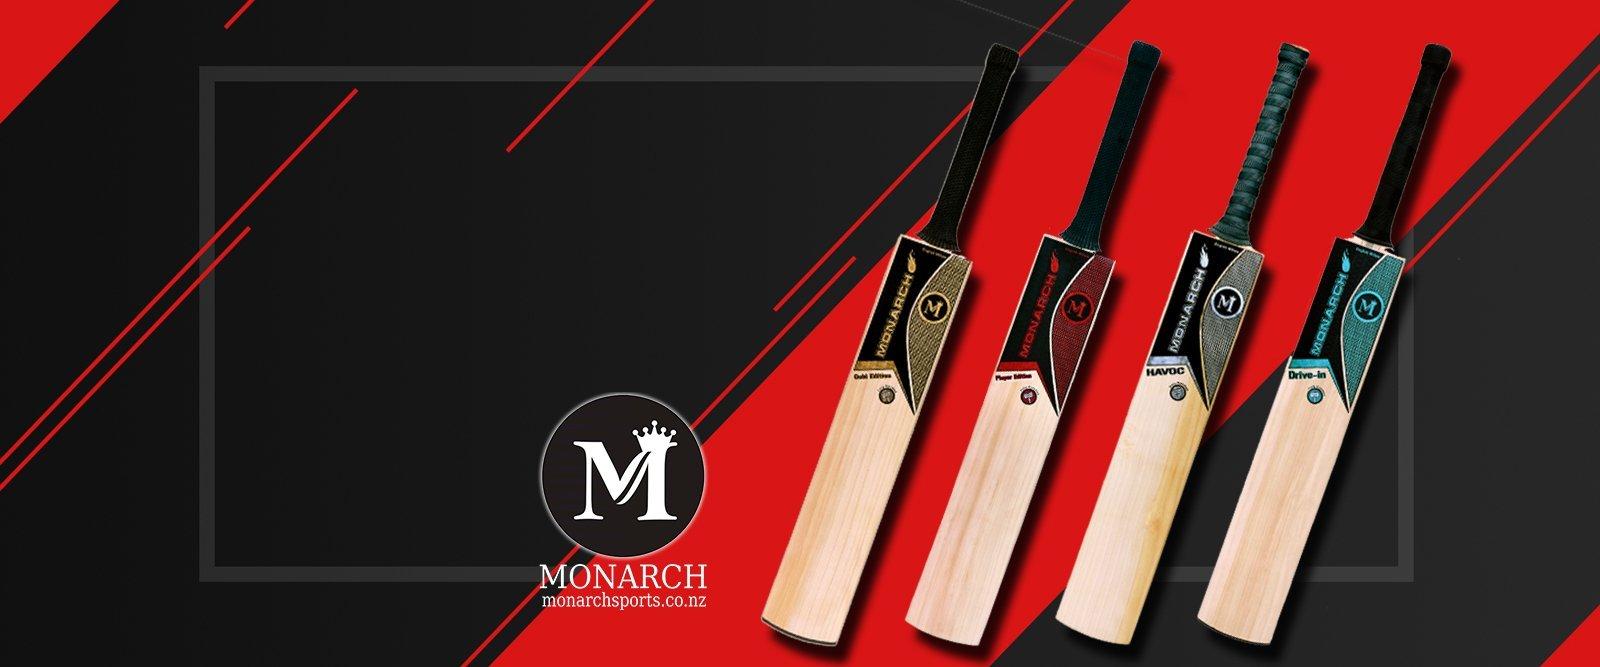 www.monarchsports.co.nz